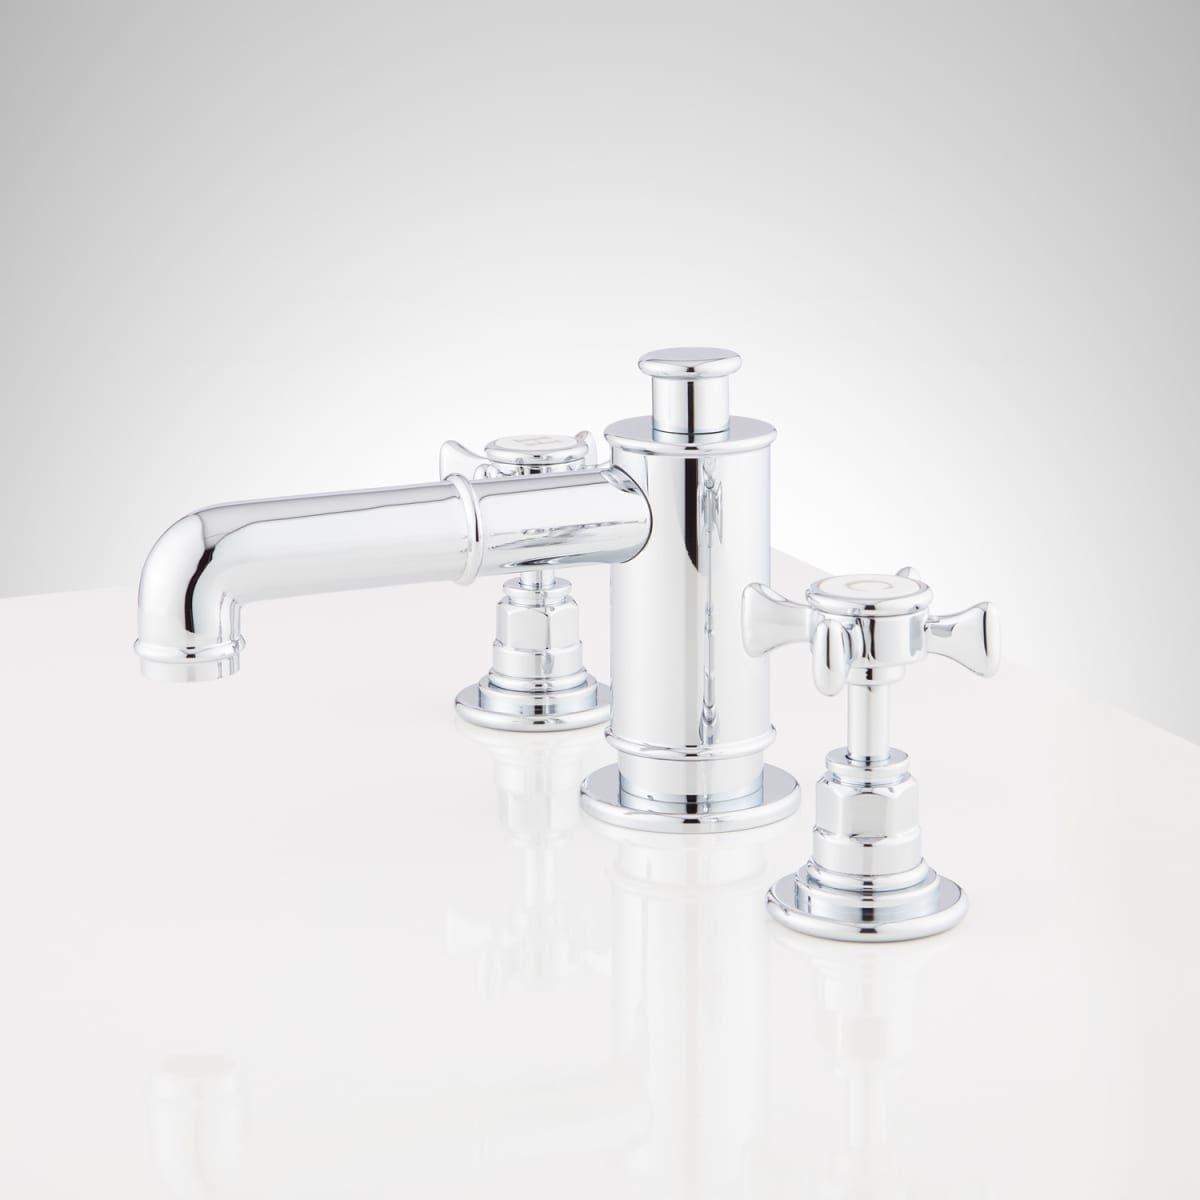 Signature Hardware 433017 Waterson 1 2 Gpm Build Com Bathroom Faucets Widespread Bathroom Faucet Faucet [ 1200 x 1200 Pixel ]